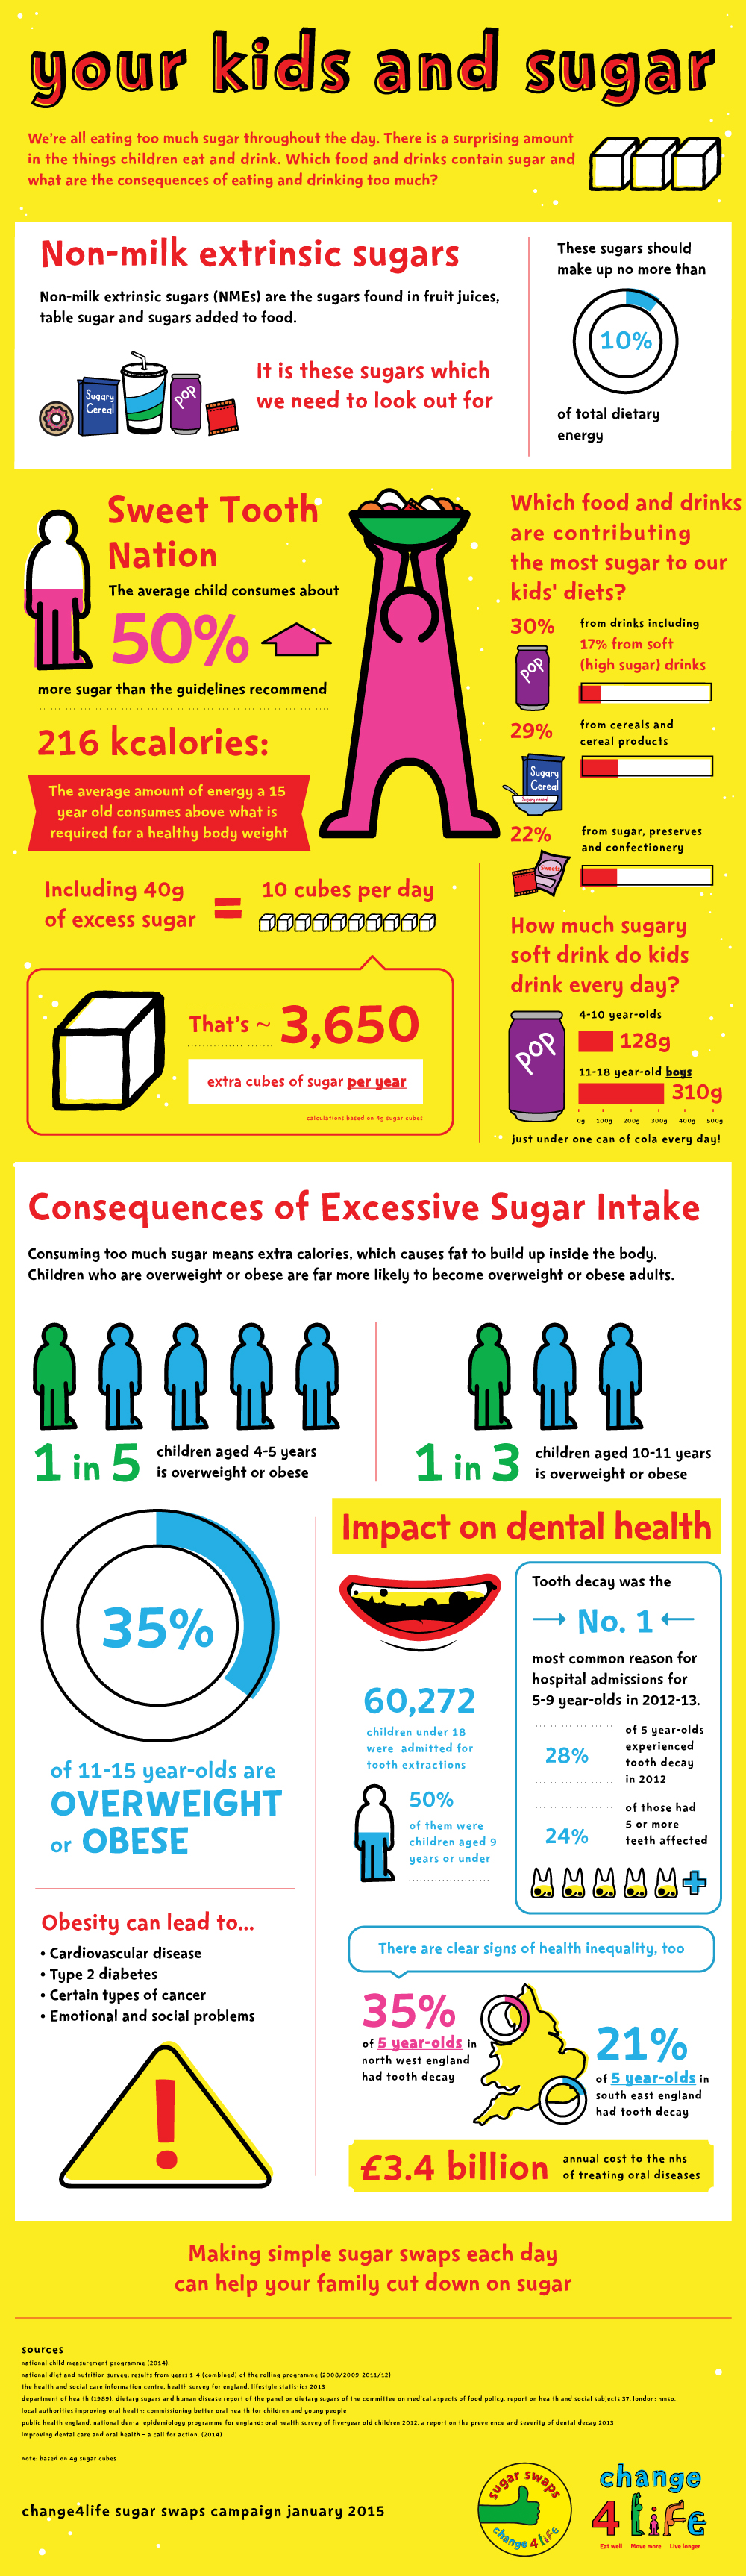 Change4Life_Sugar_Swaps_Infographic_full_(3).jpeg